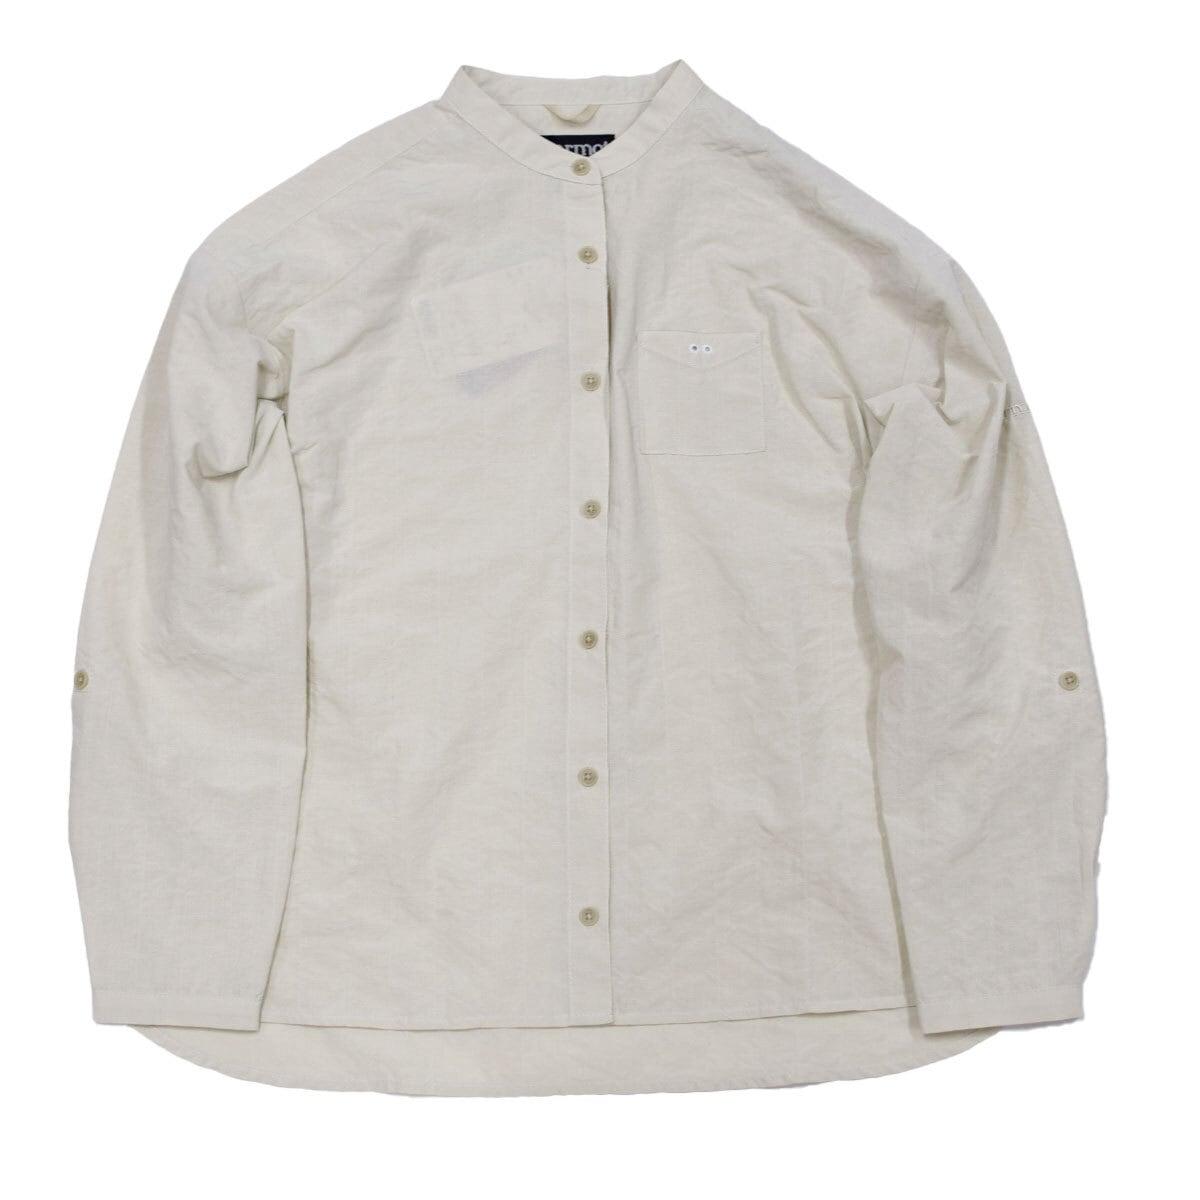 Marmot W's L/S Linen-Like Shirt  ウィメンズロングスリーブリネンライクシャツ(四角友里コラボ)